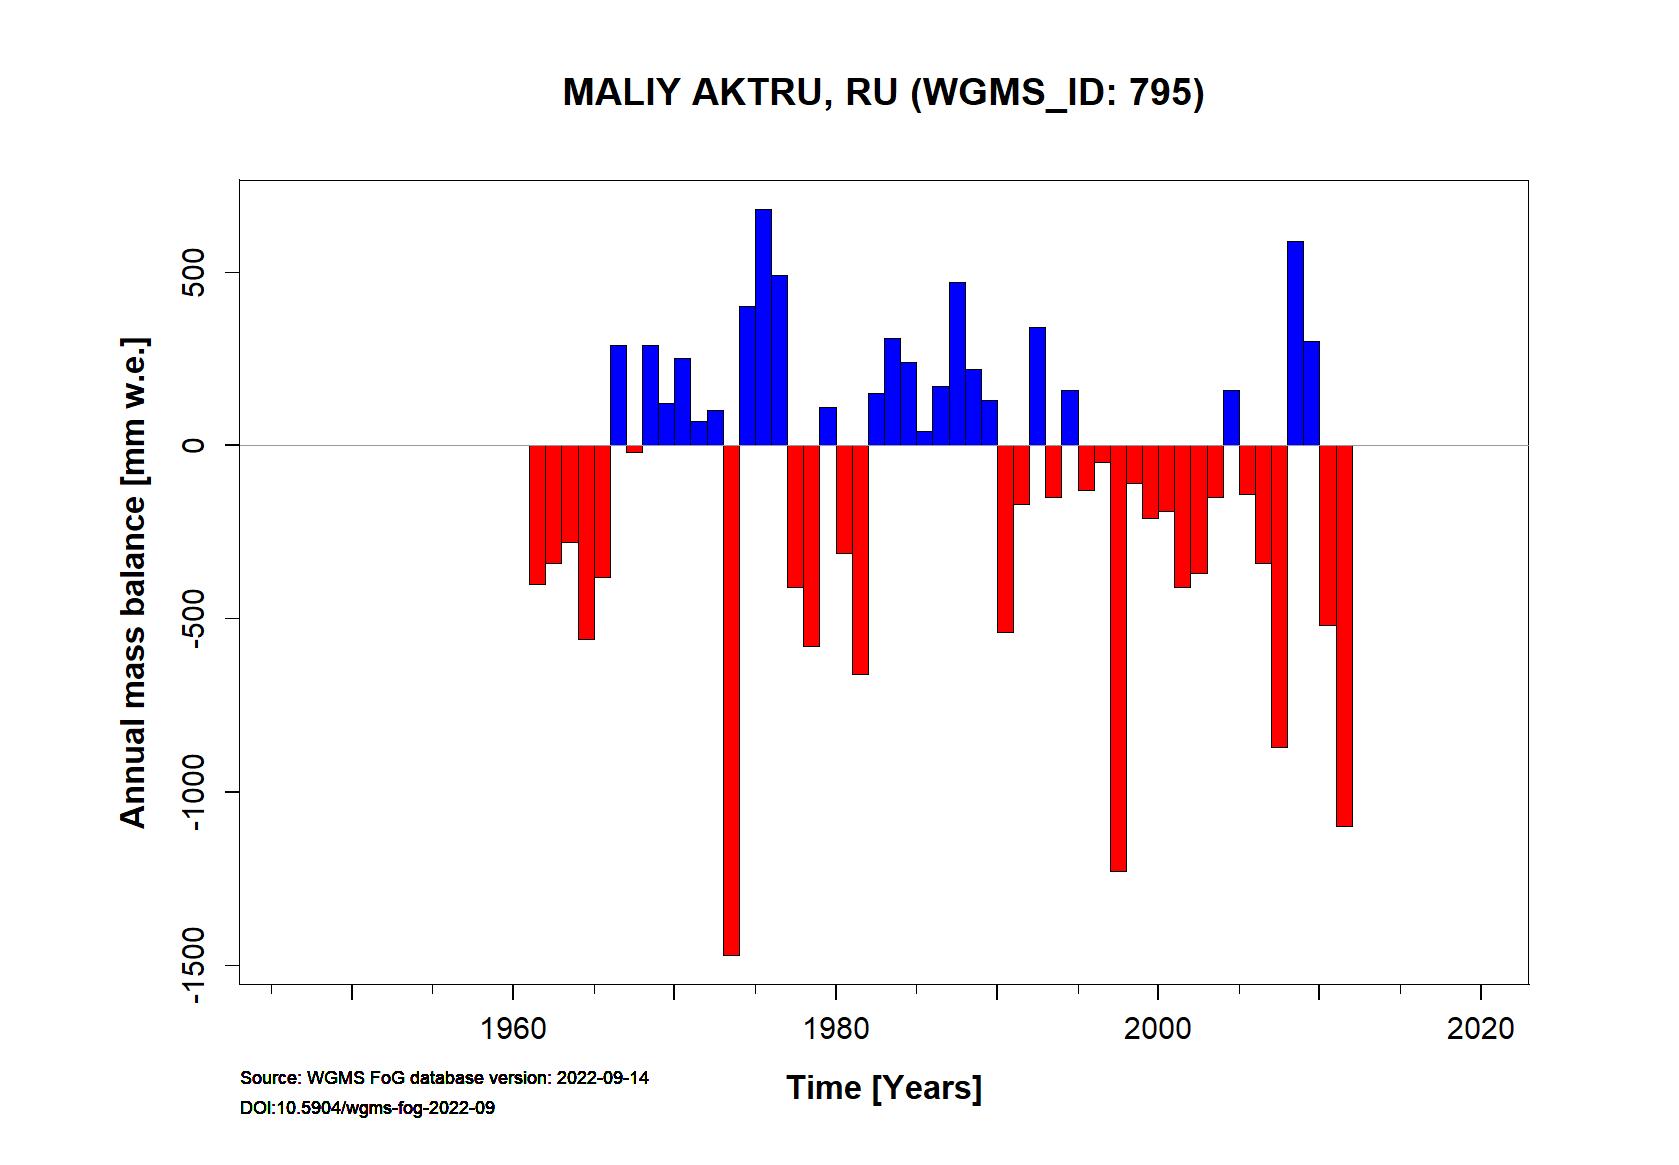 Maliy Aktru glacier Annual Mass Balance (WGMS, 2016)